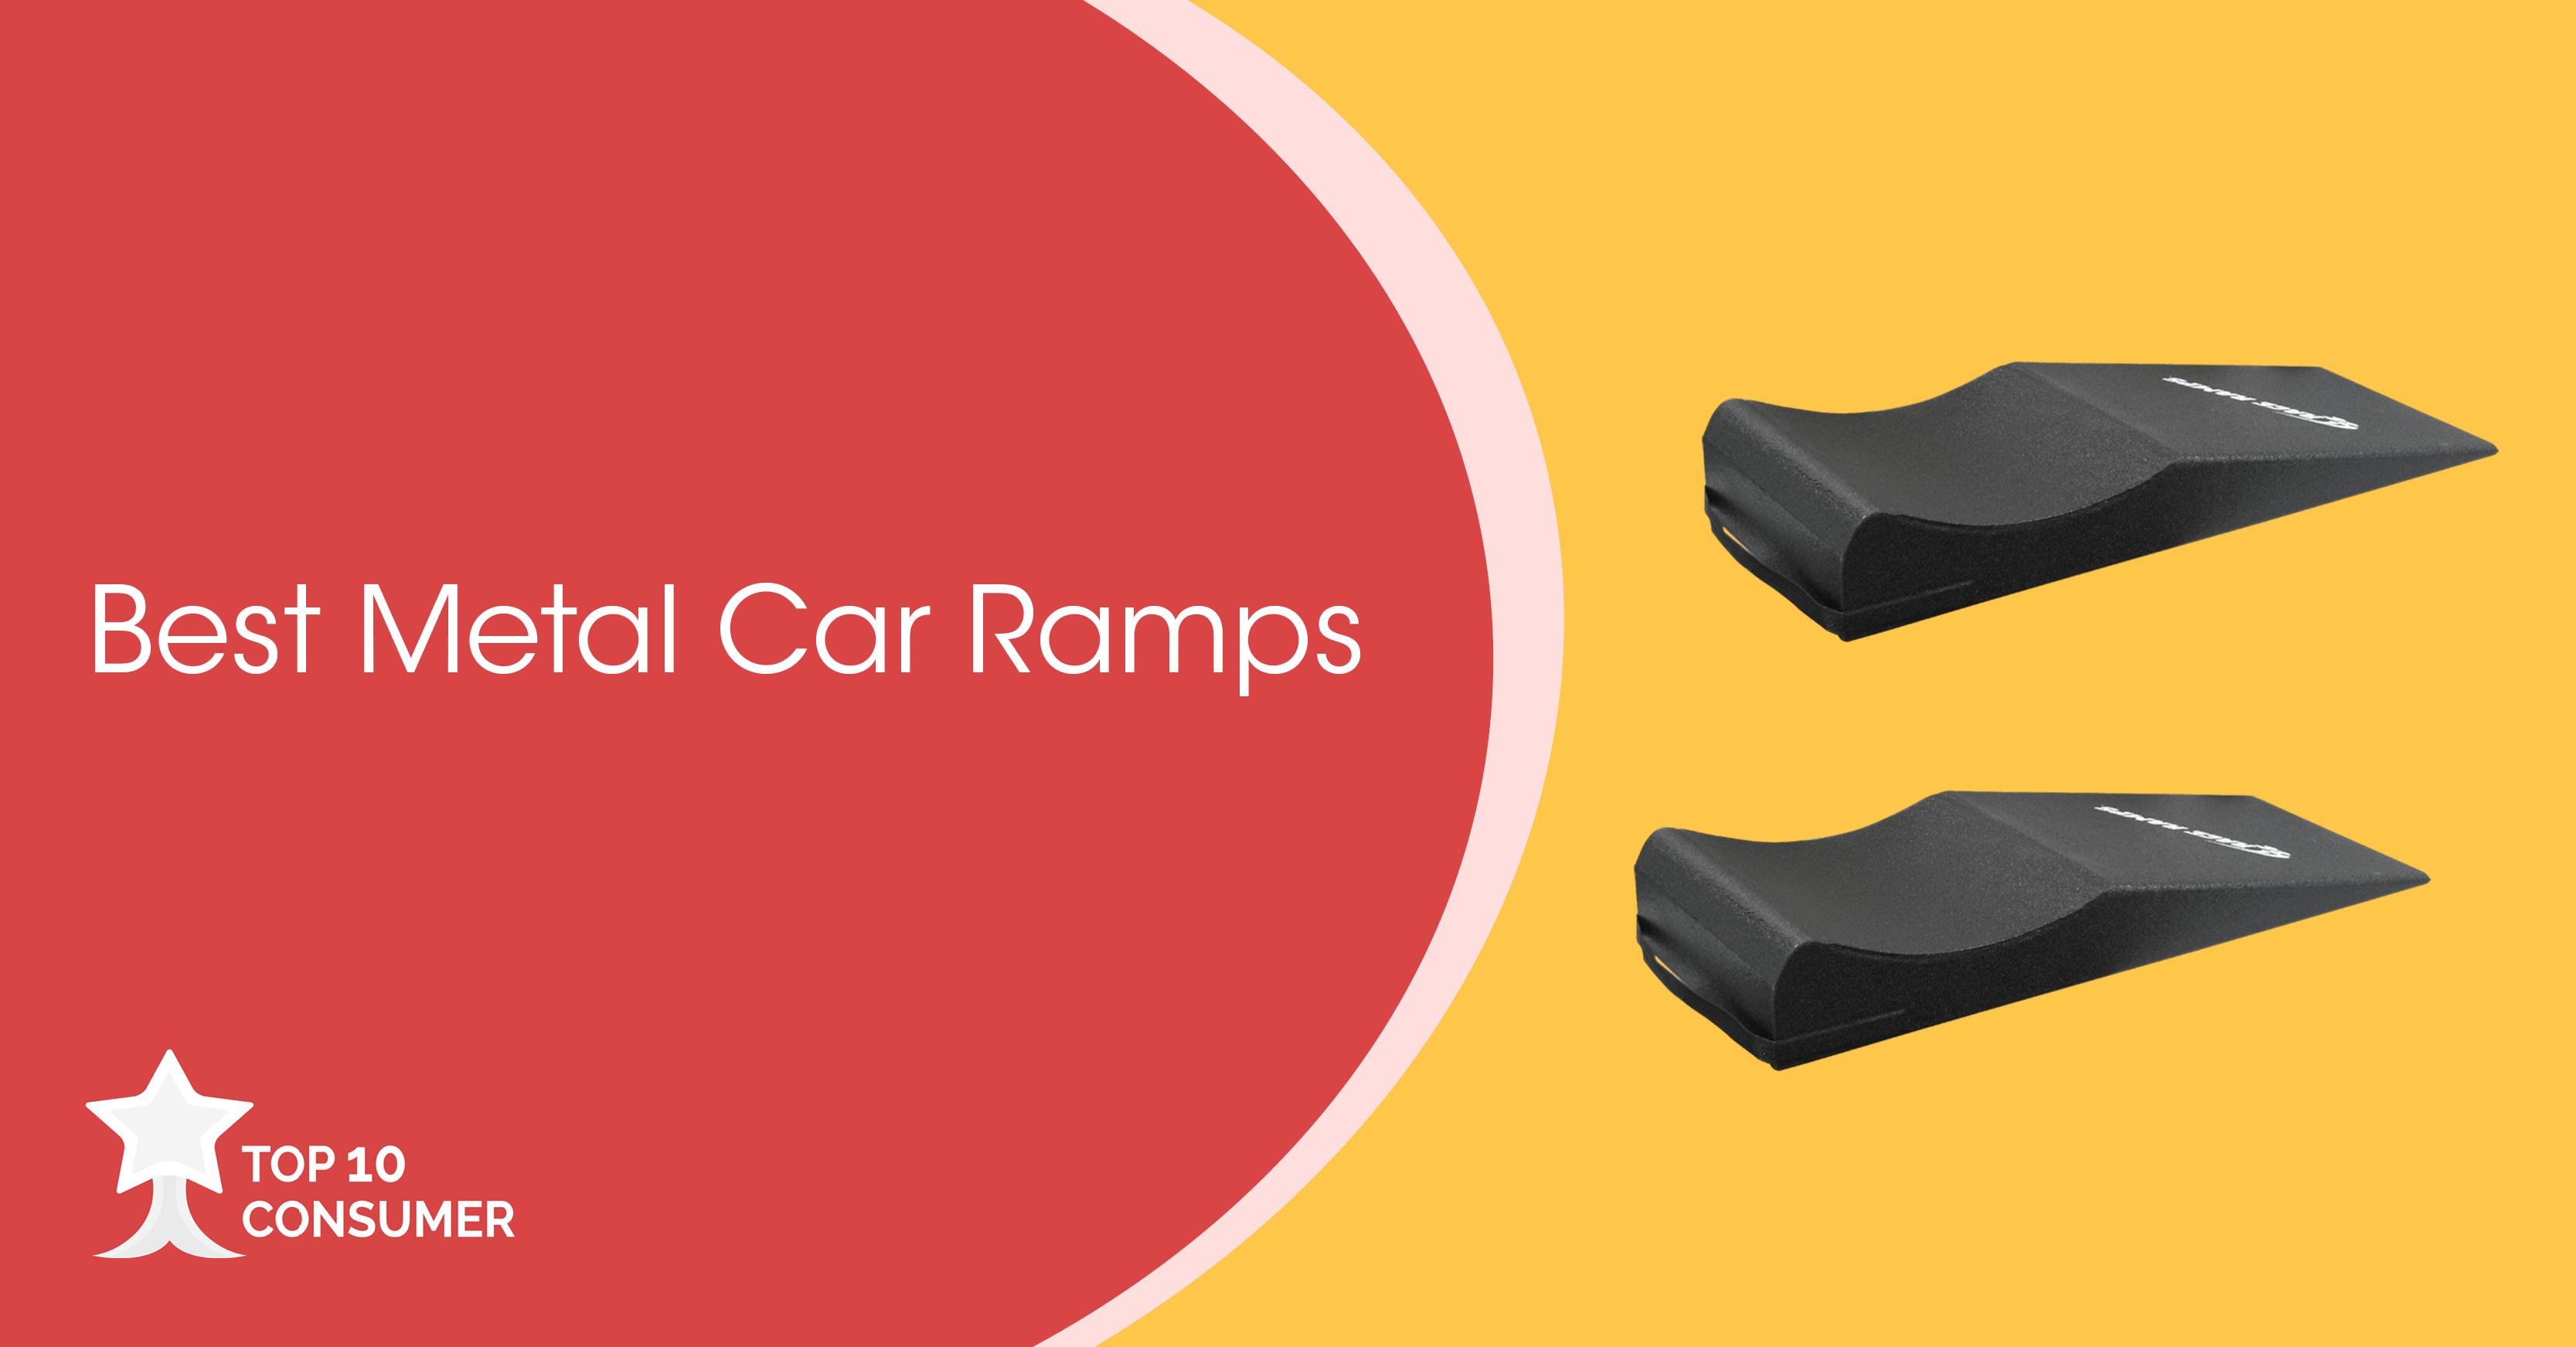 Best Metal Car Ramps